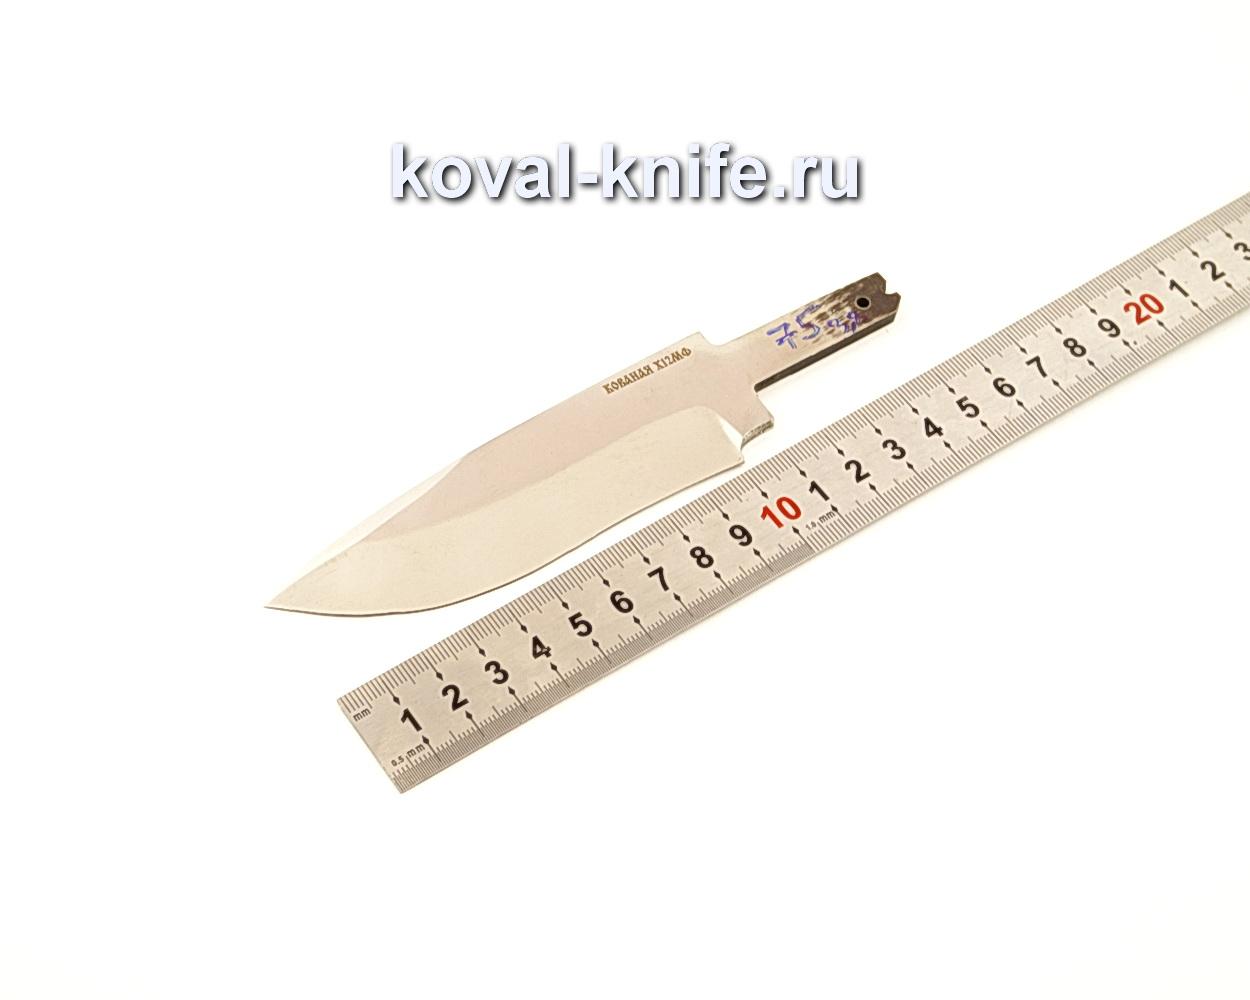 Клинок для ножа из кованой стали Х12МФ N75